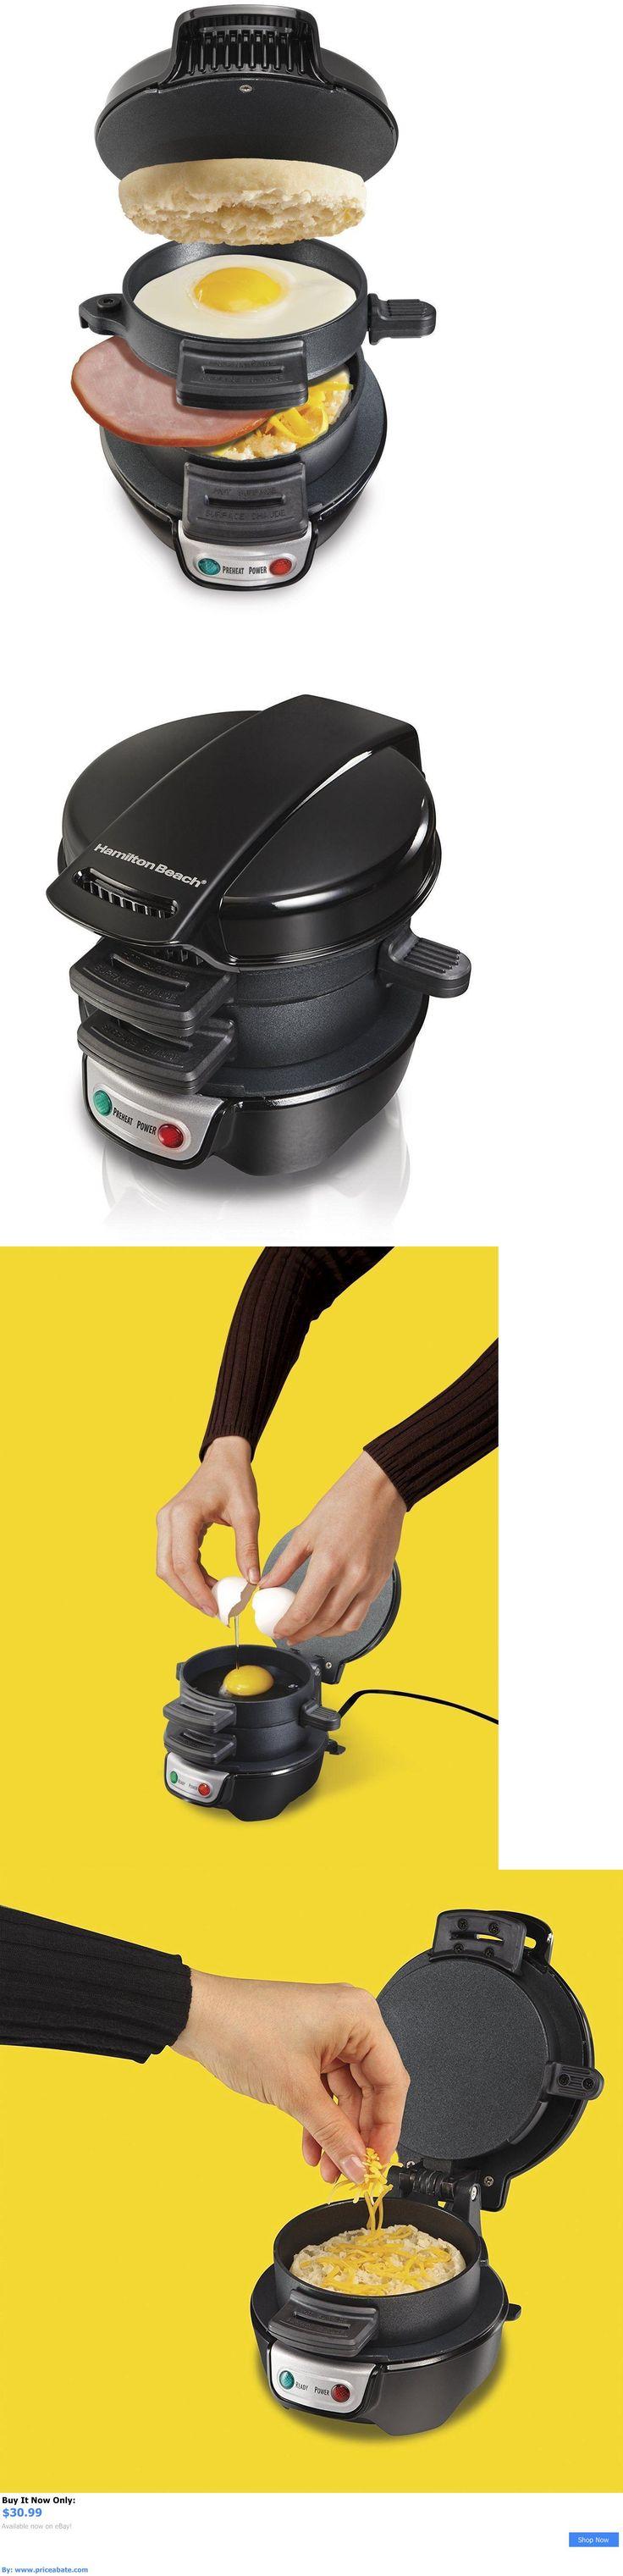 appliances: Hamilton Beach 25490 Black Dual Breakfast Sandwich Maker New BUY IT NOW ONLY: $30.99 #priceabateappliances OR #priceabate